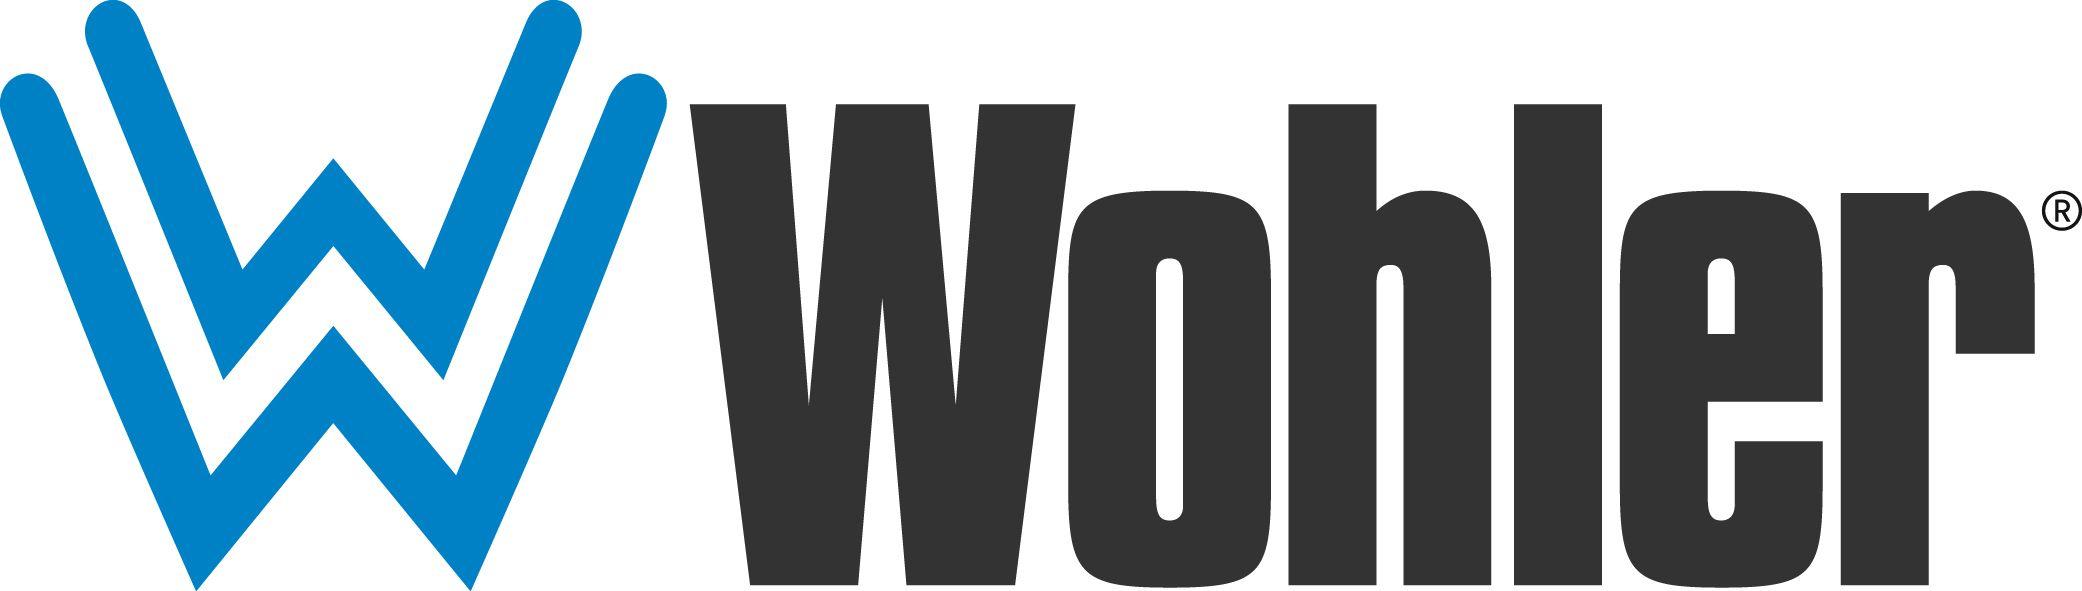 Wohler Technologies, Inc Logo